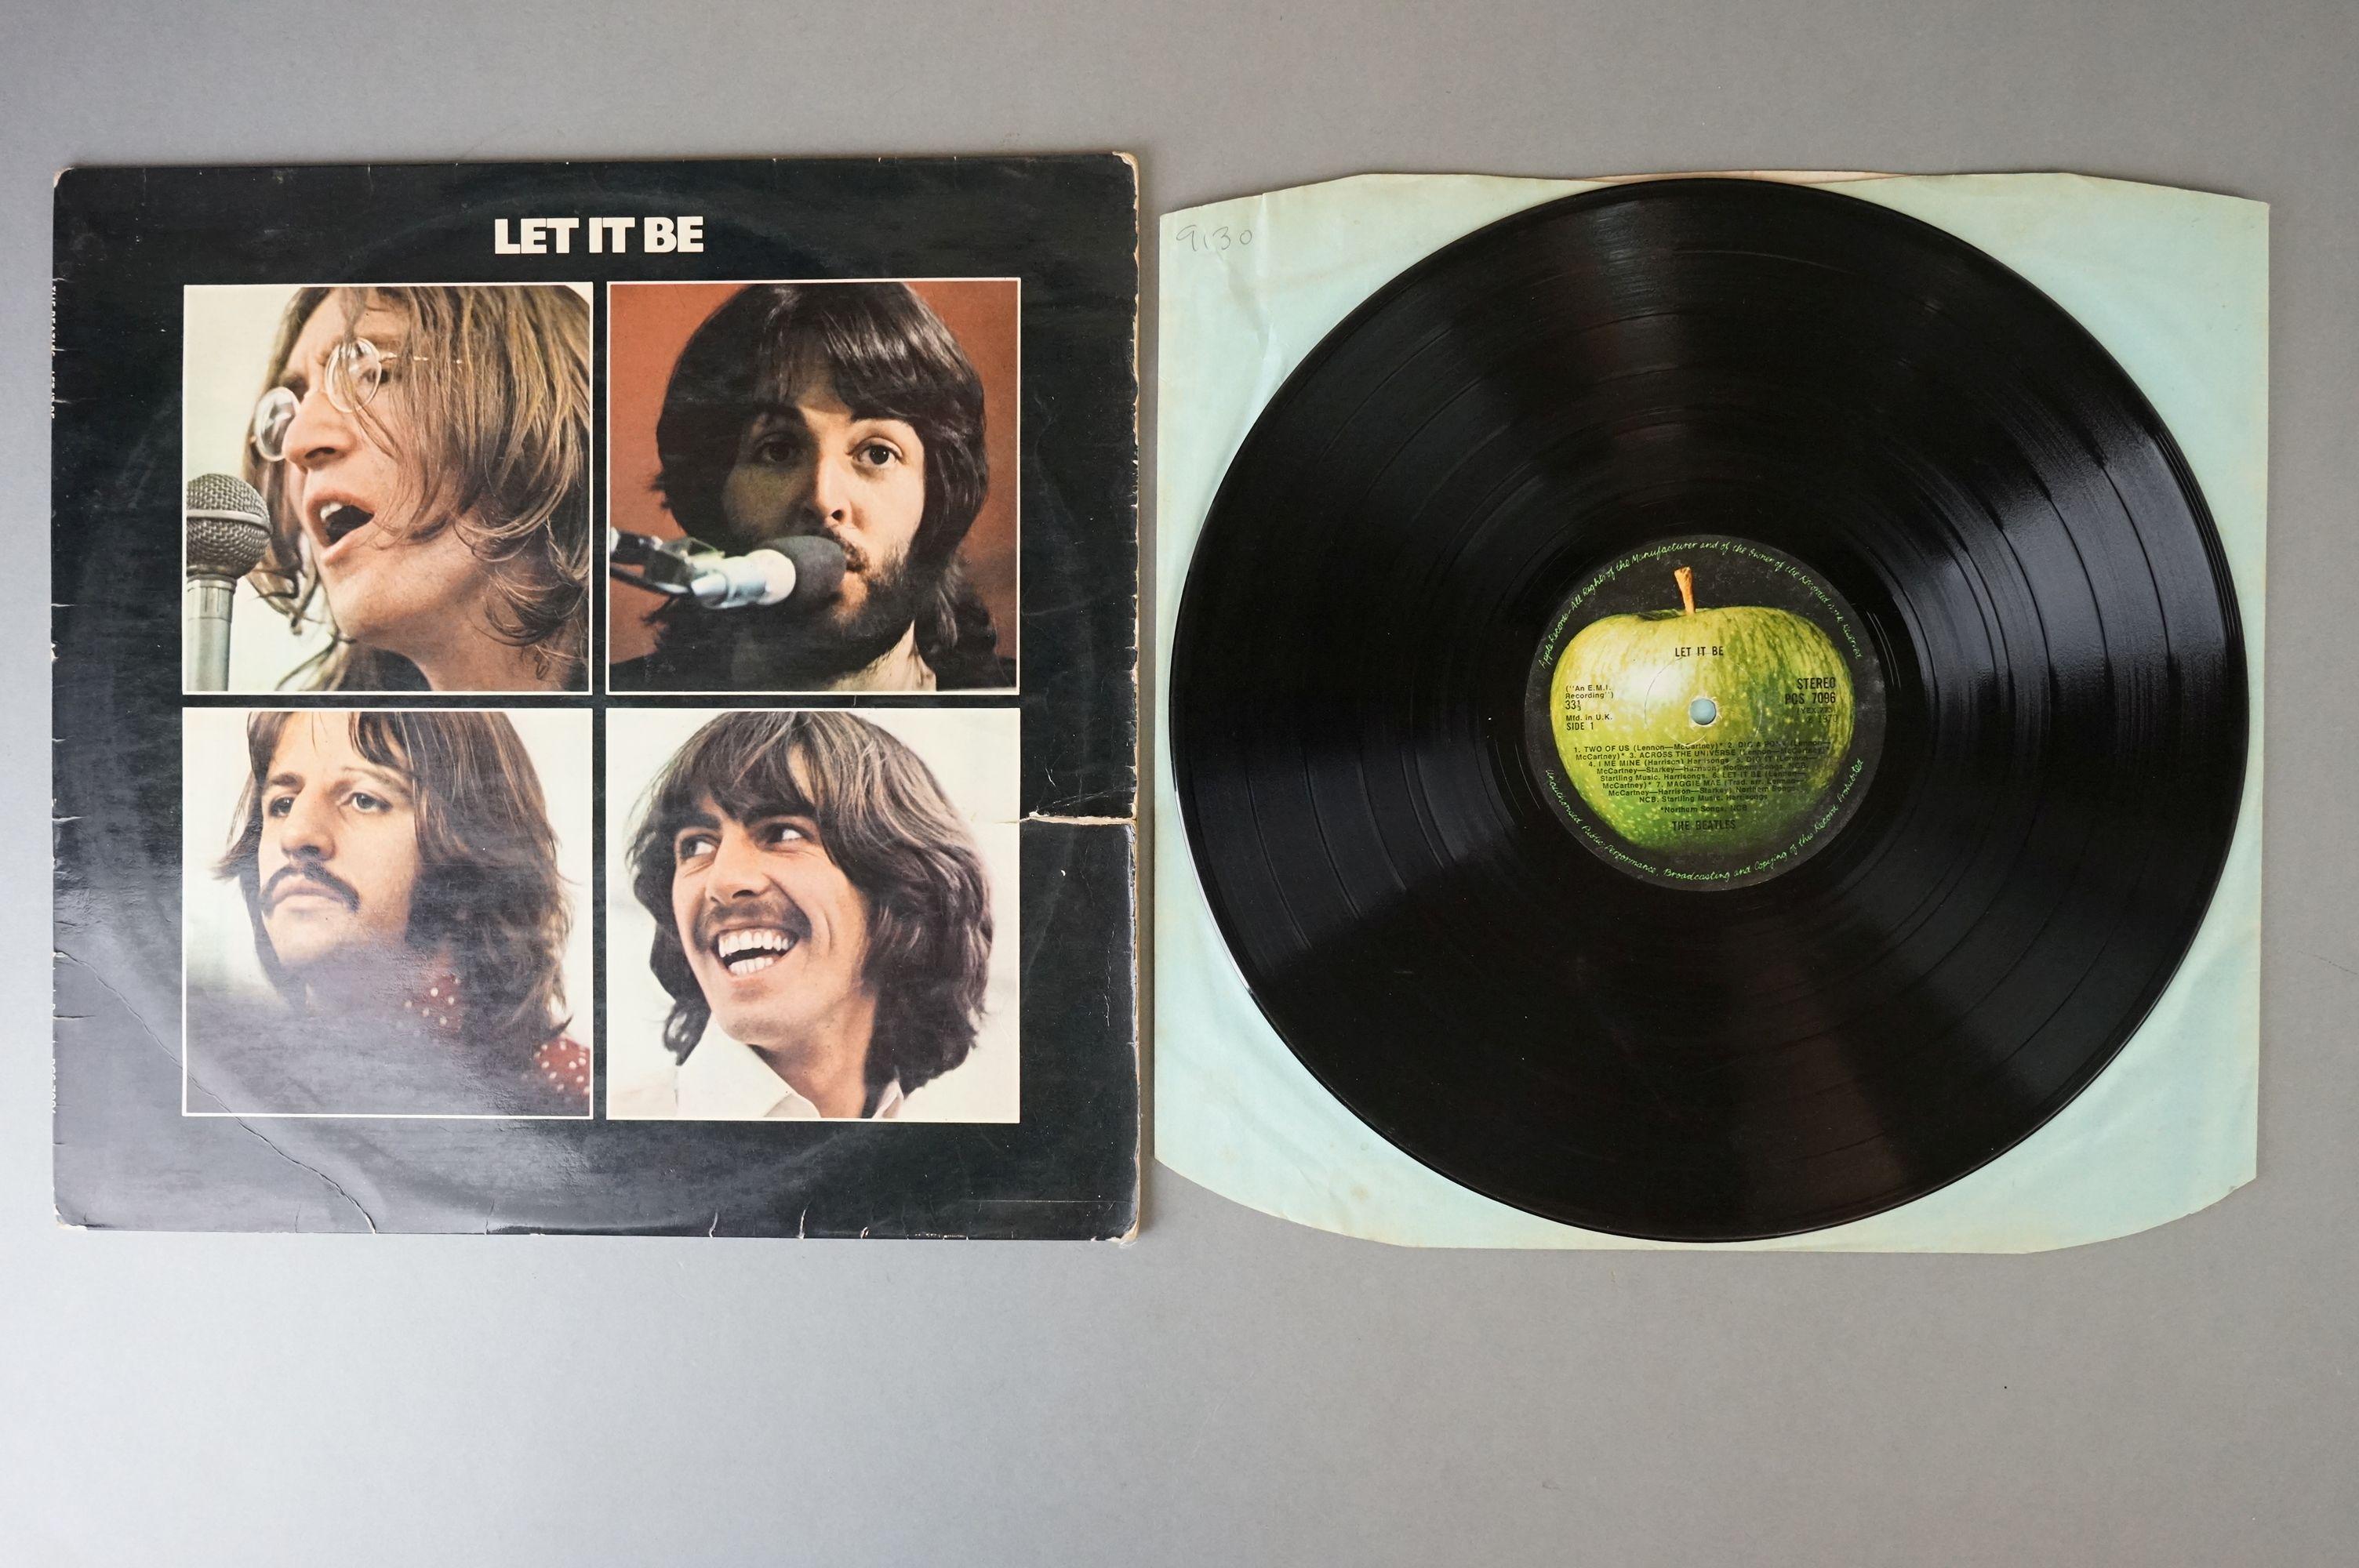 Vinyl - The Beatles & John Lennon 3 LP's to include Let It Be (PCS 7096) Stereo, incorrect inner, - Image 7 of 8